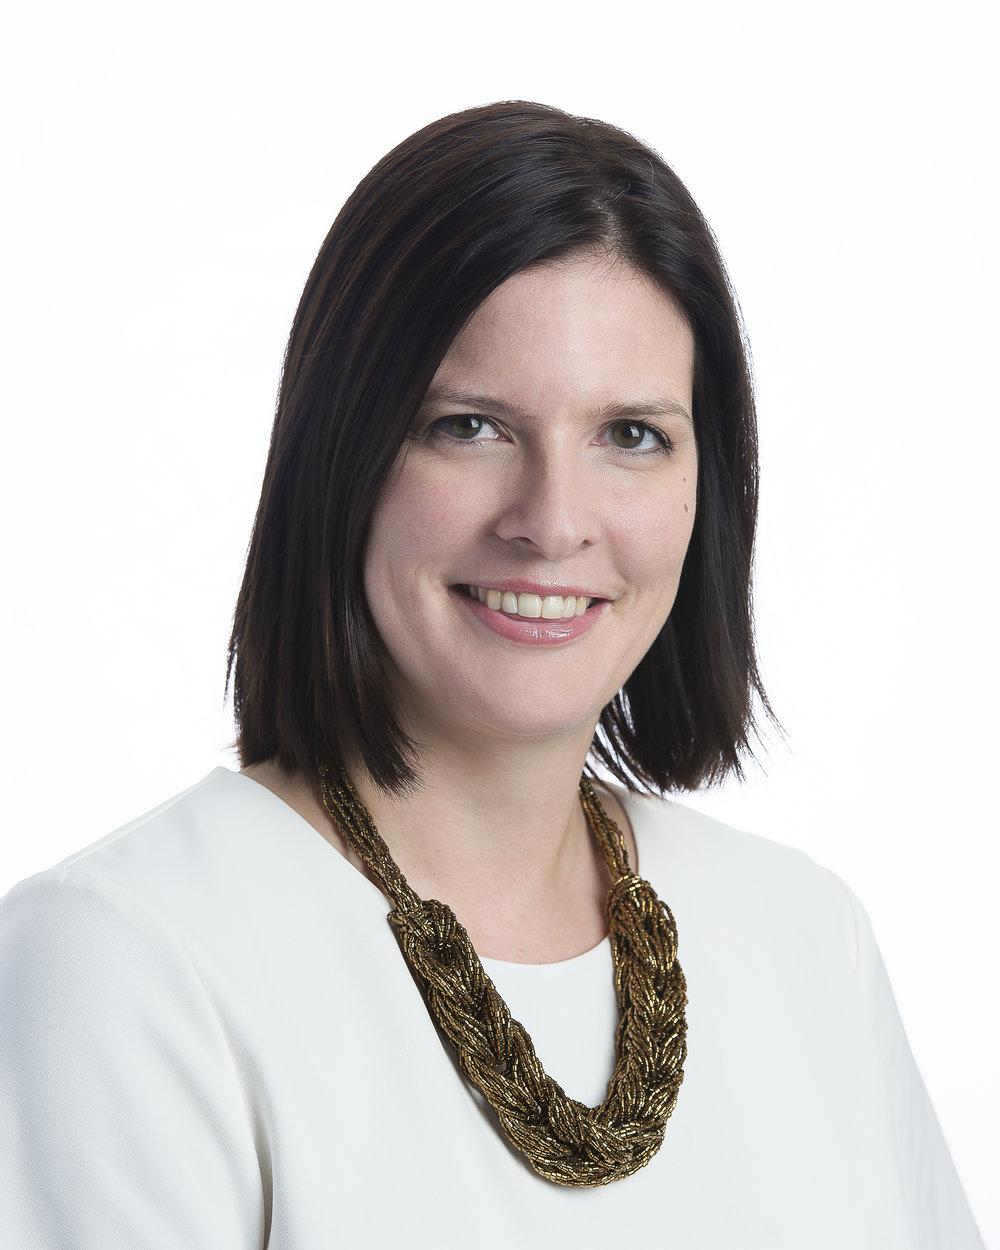 Marie-Claude Desjardins, Professeure adjointe, Faculté de droit, Université de Sherbrooke